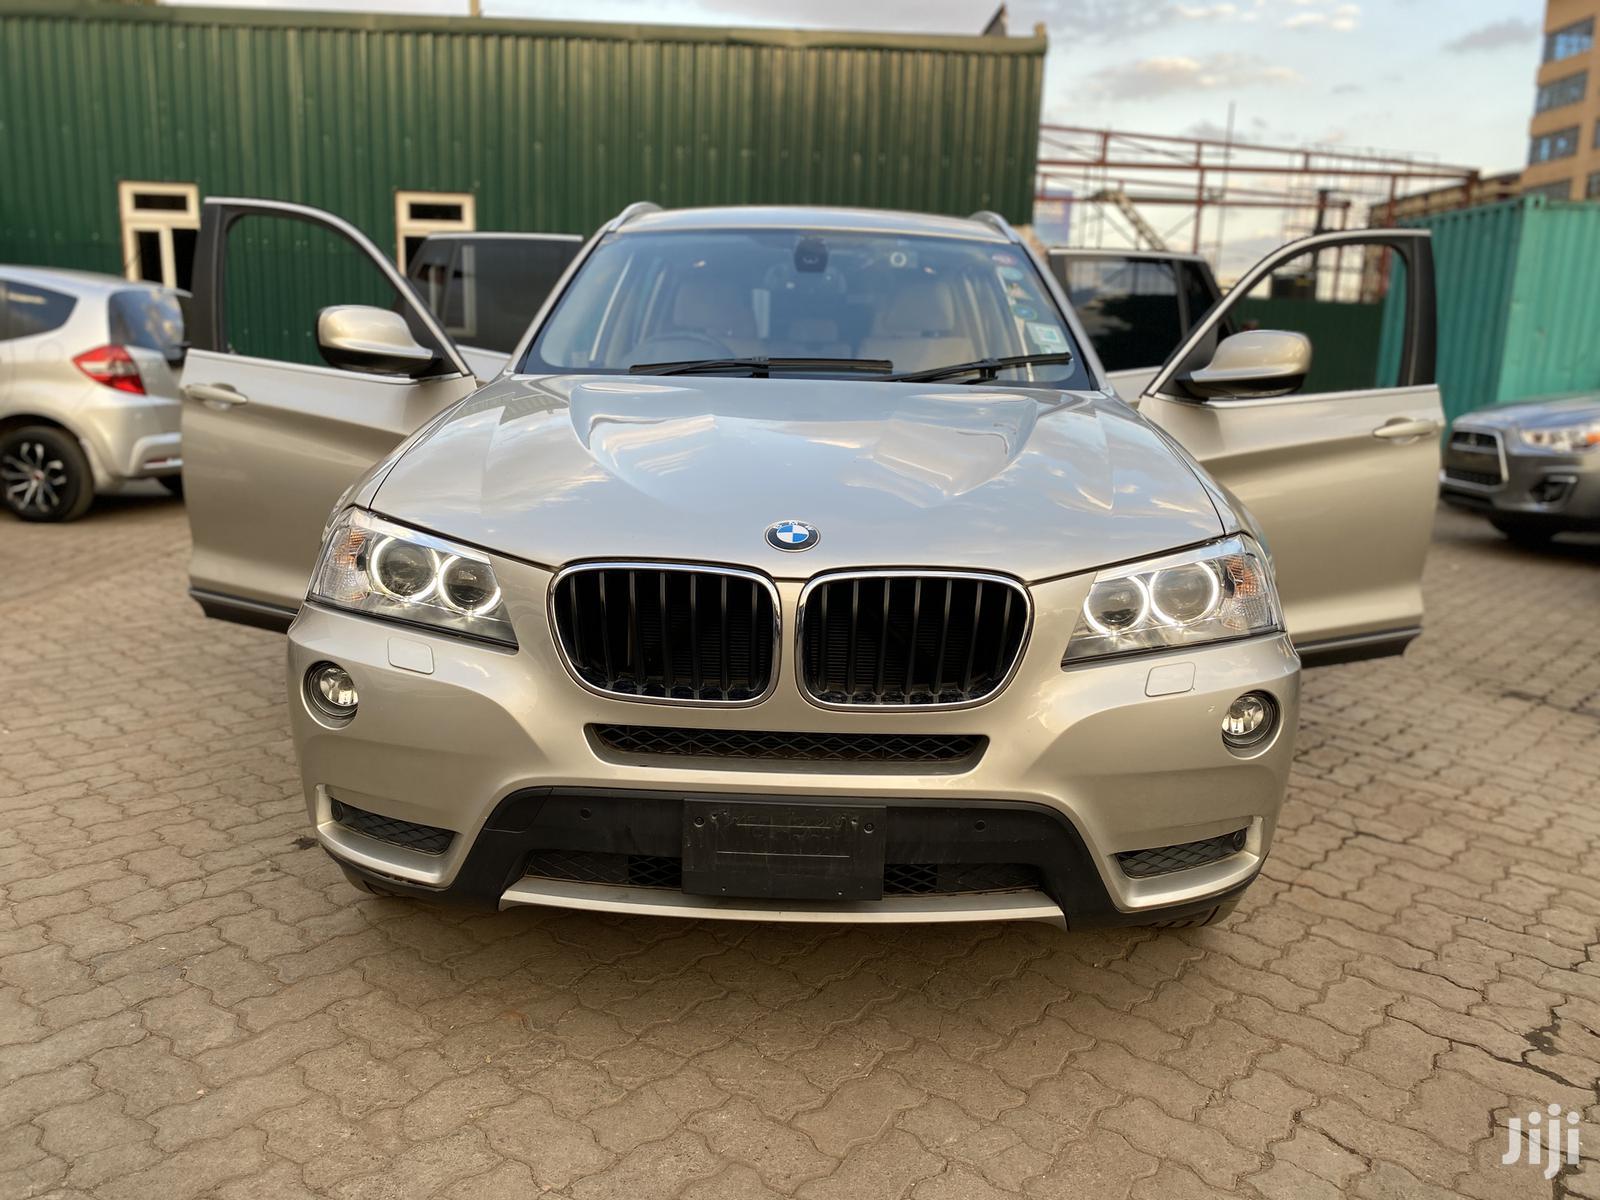 BMW X3 2013 xDrive28i Beige